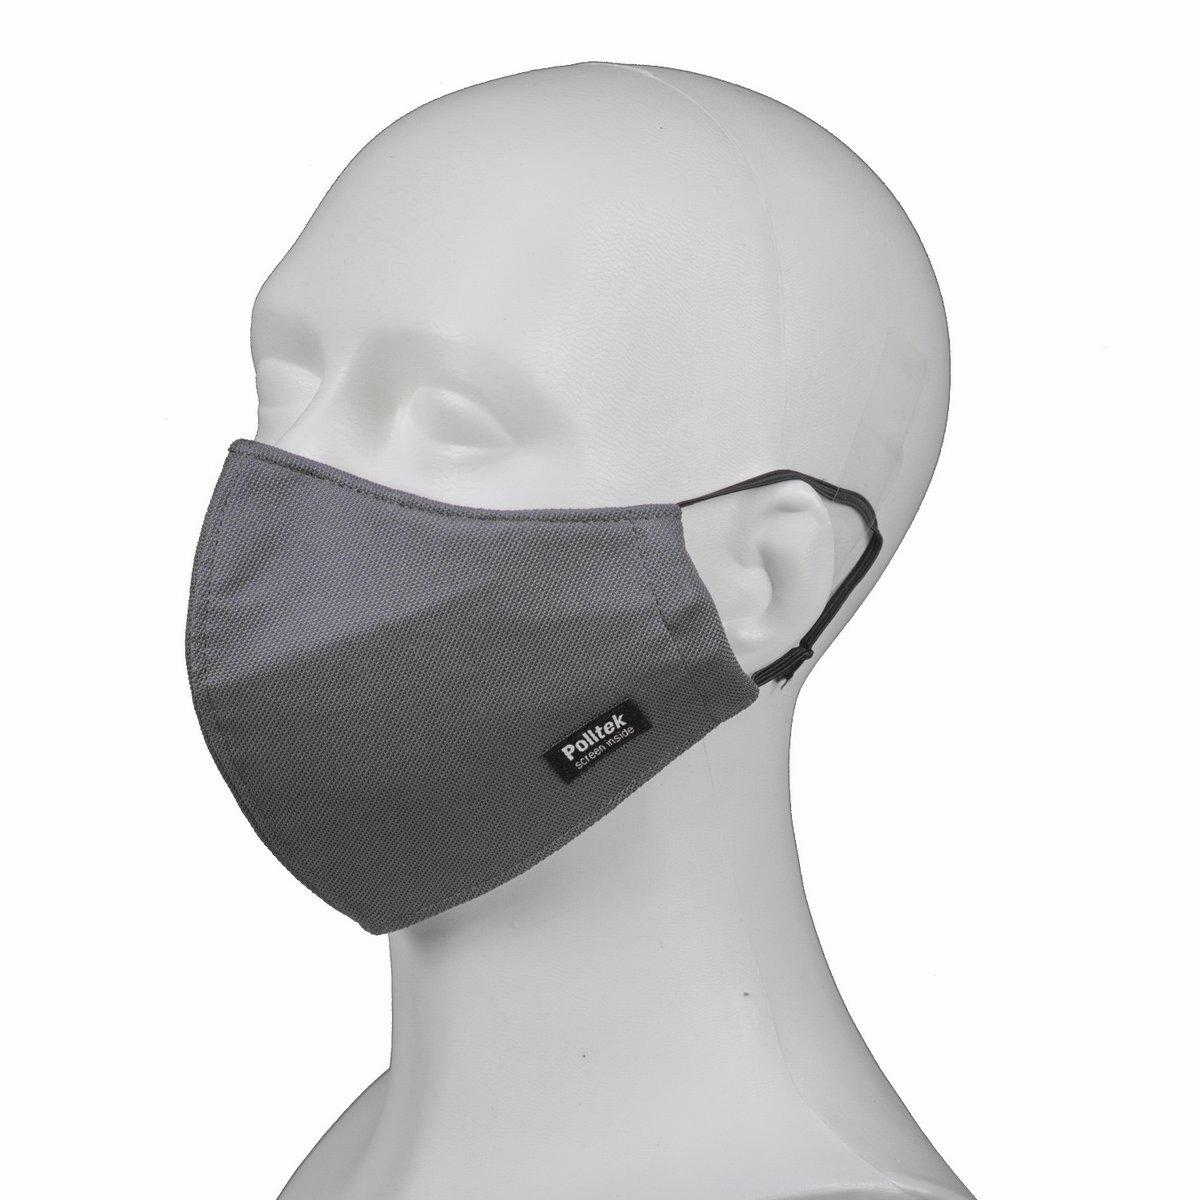 Polltek ultra-fijnstof mondkapje N95 active carbon kleur donkergrijs